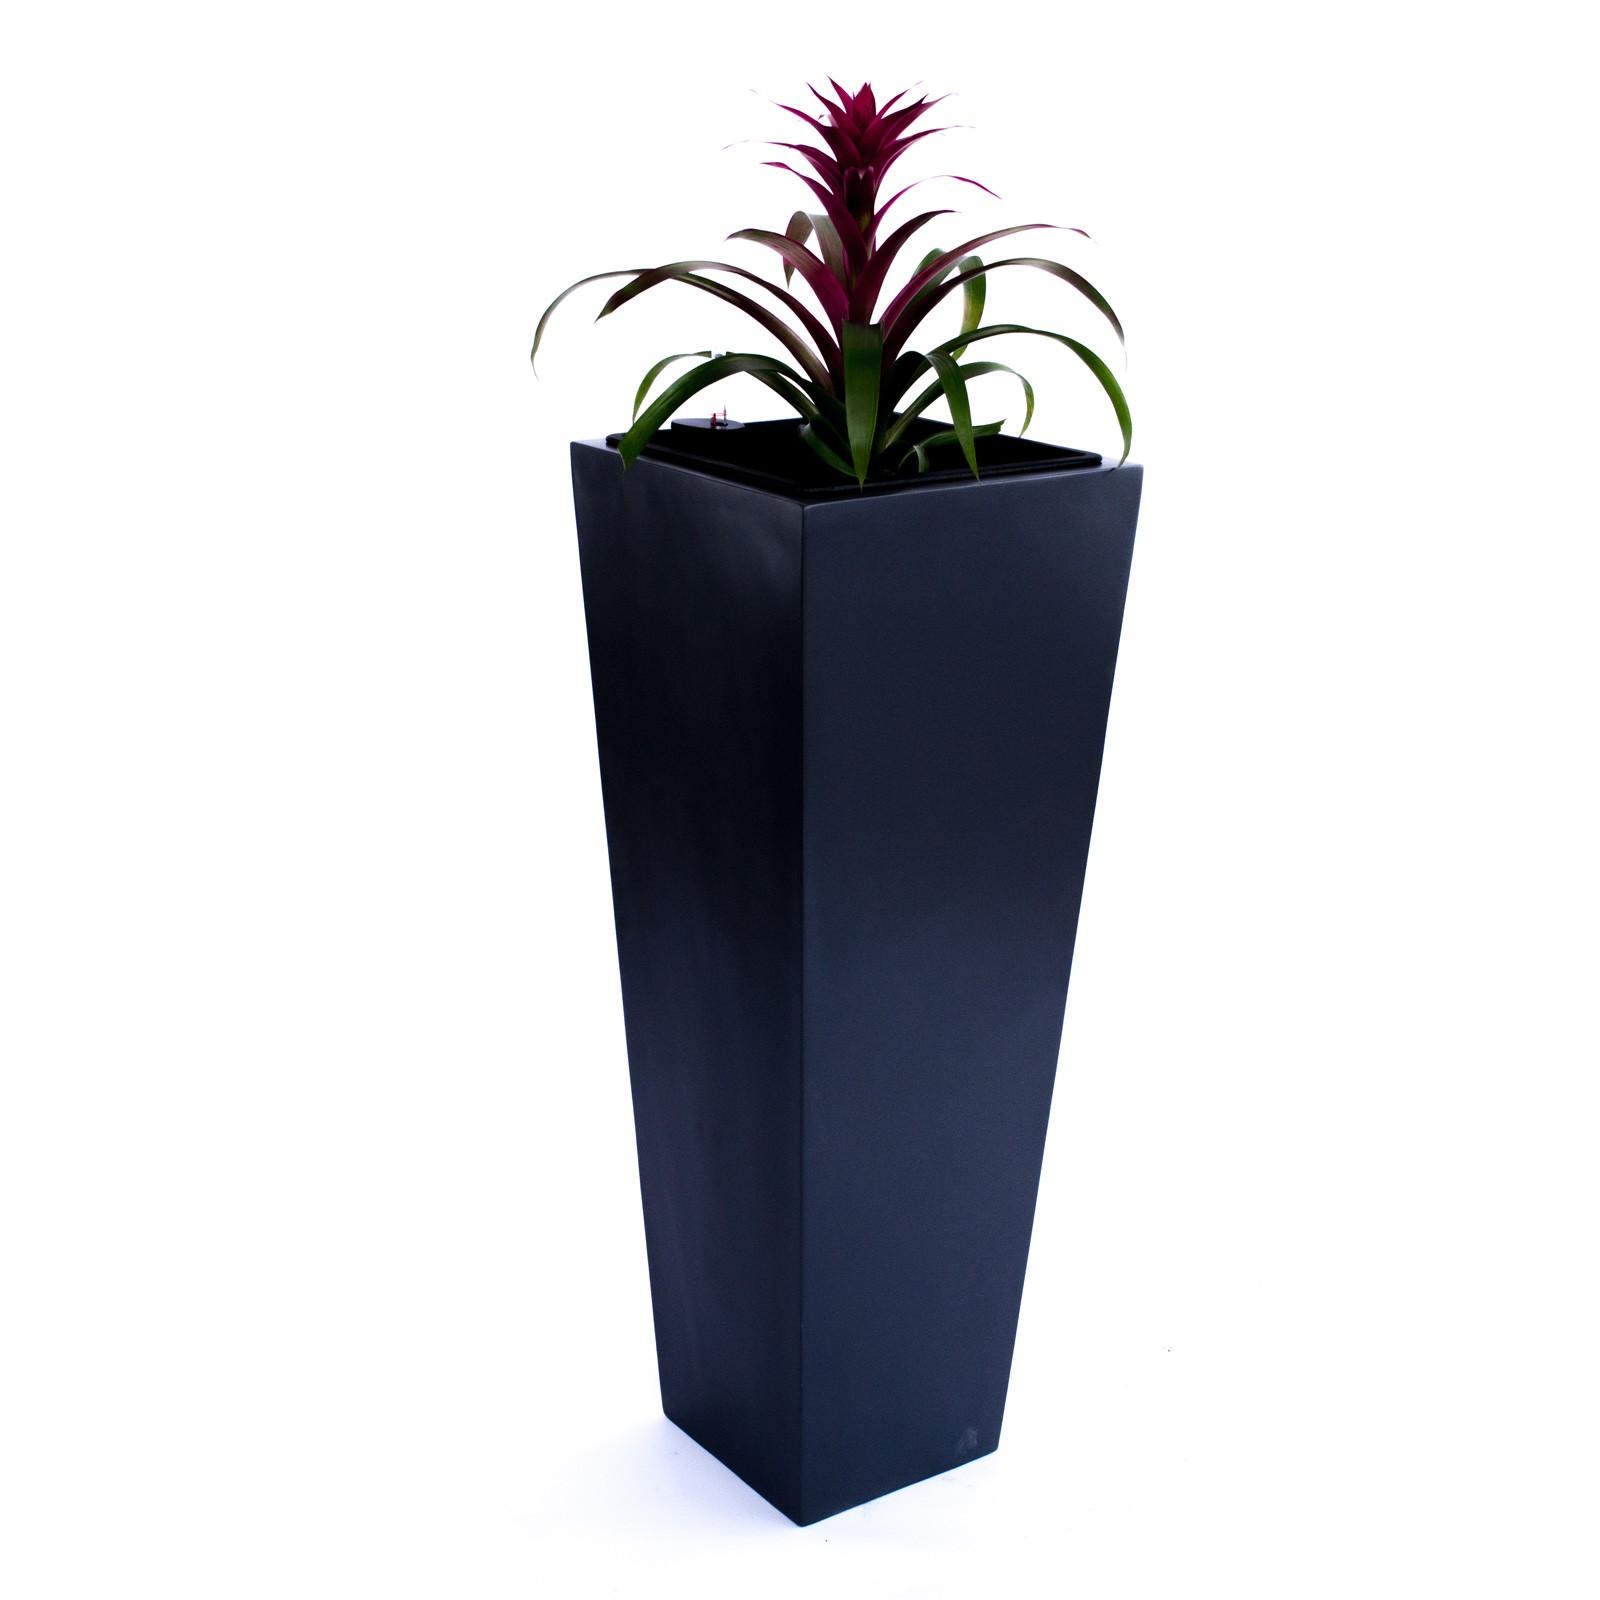 favorit blumentopf gro anthrazit ue79 kyushucon. Black Bedroom Furniture Sets. Home Design Ideas